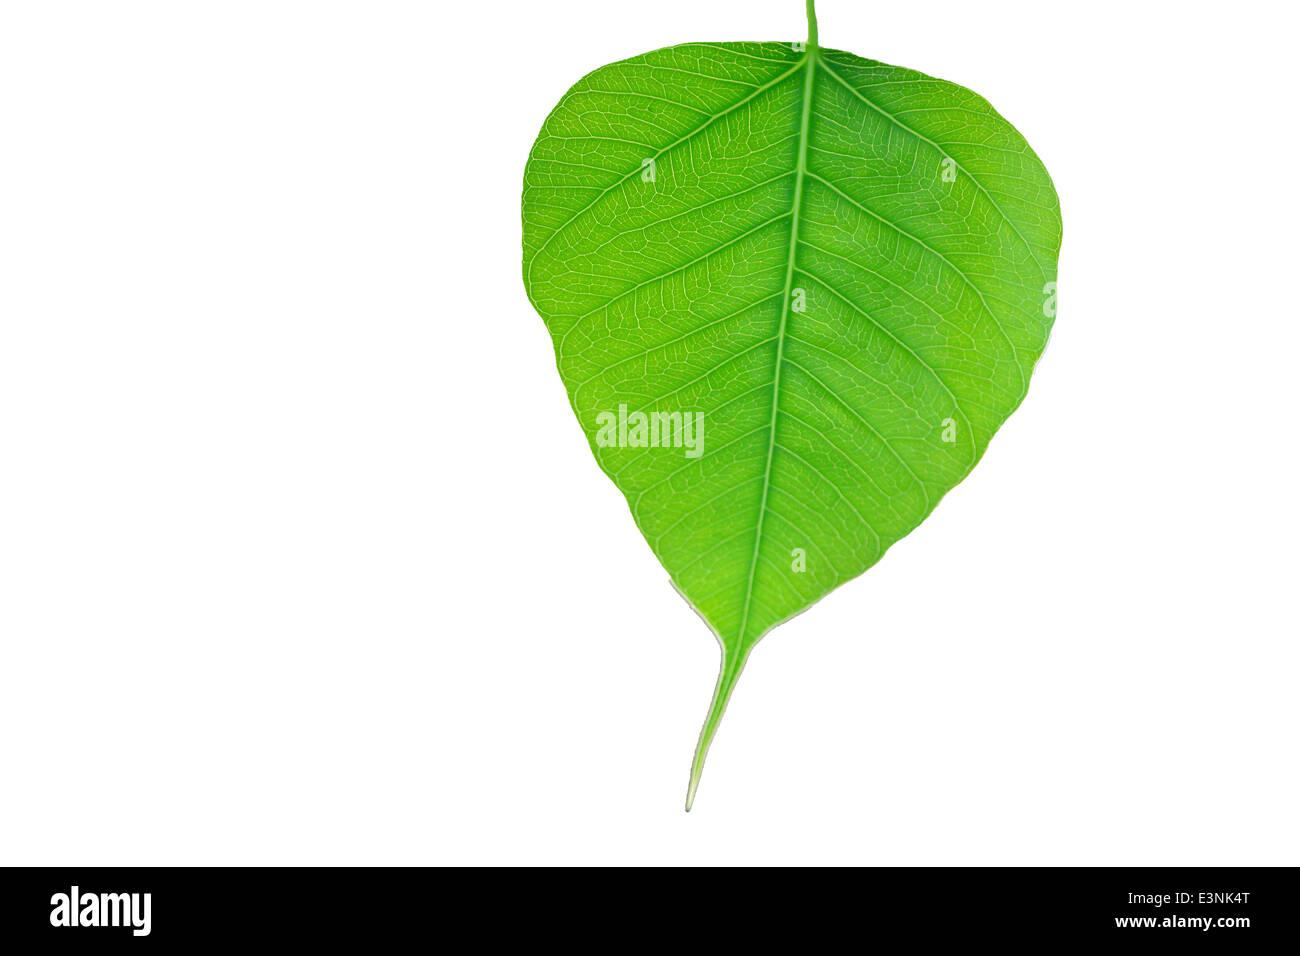 bodhi, tree, bo, leaf, nature, natural, buddha, sacred, fig, gautama, gaya - Stock Image